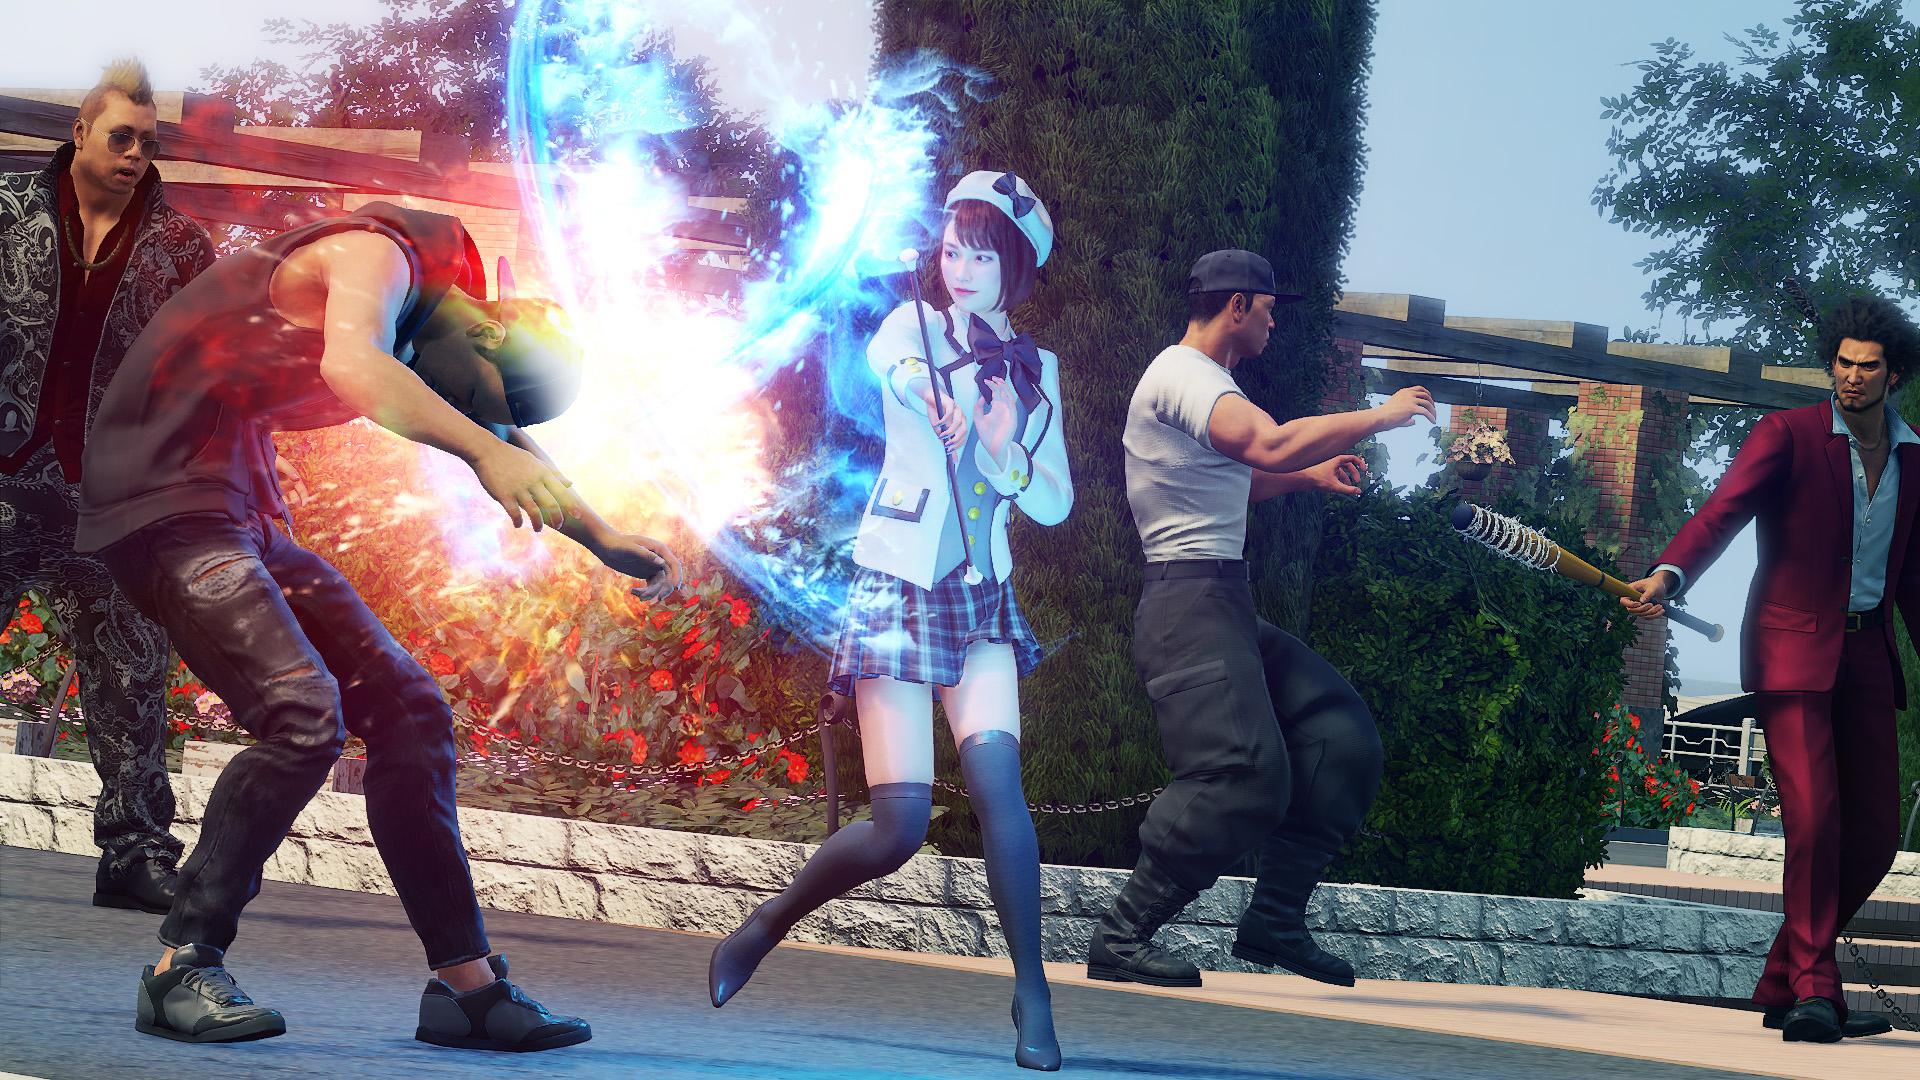 yakuza-like-a-dragon-pc-screenshot-2